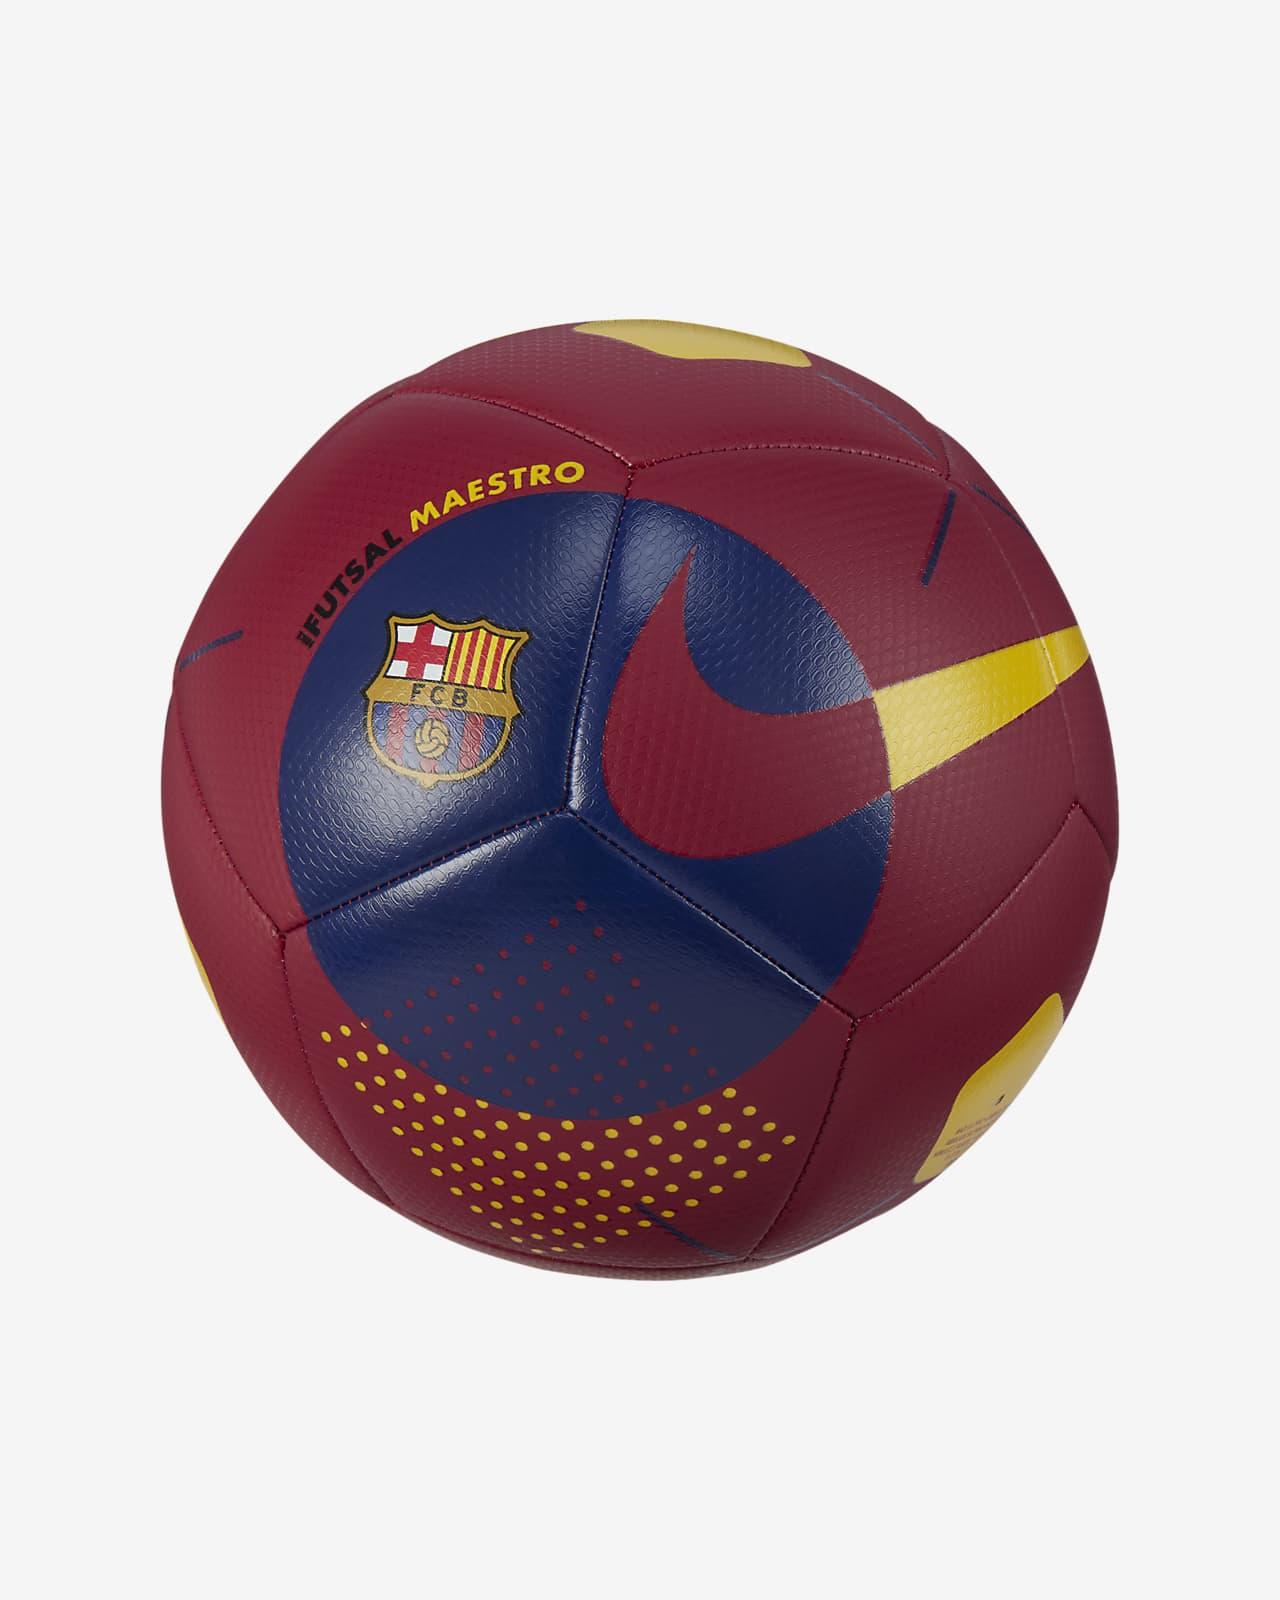 F.C. Barcelona Futsal Maestro Football